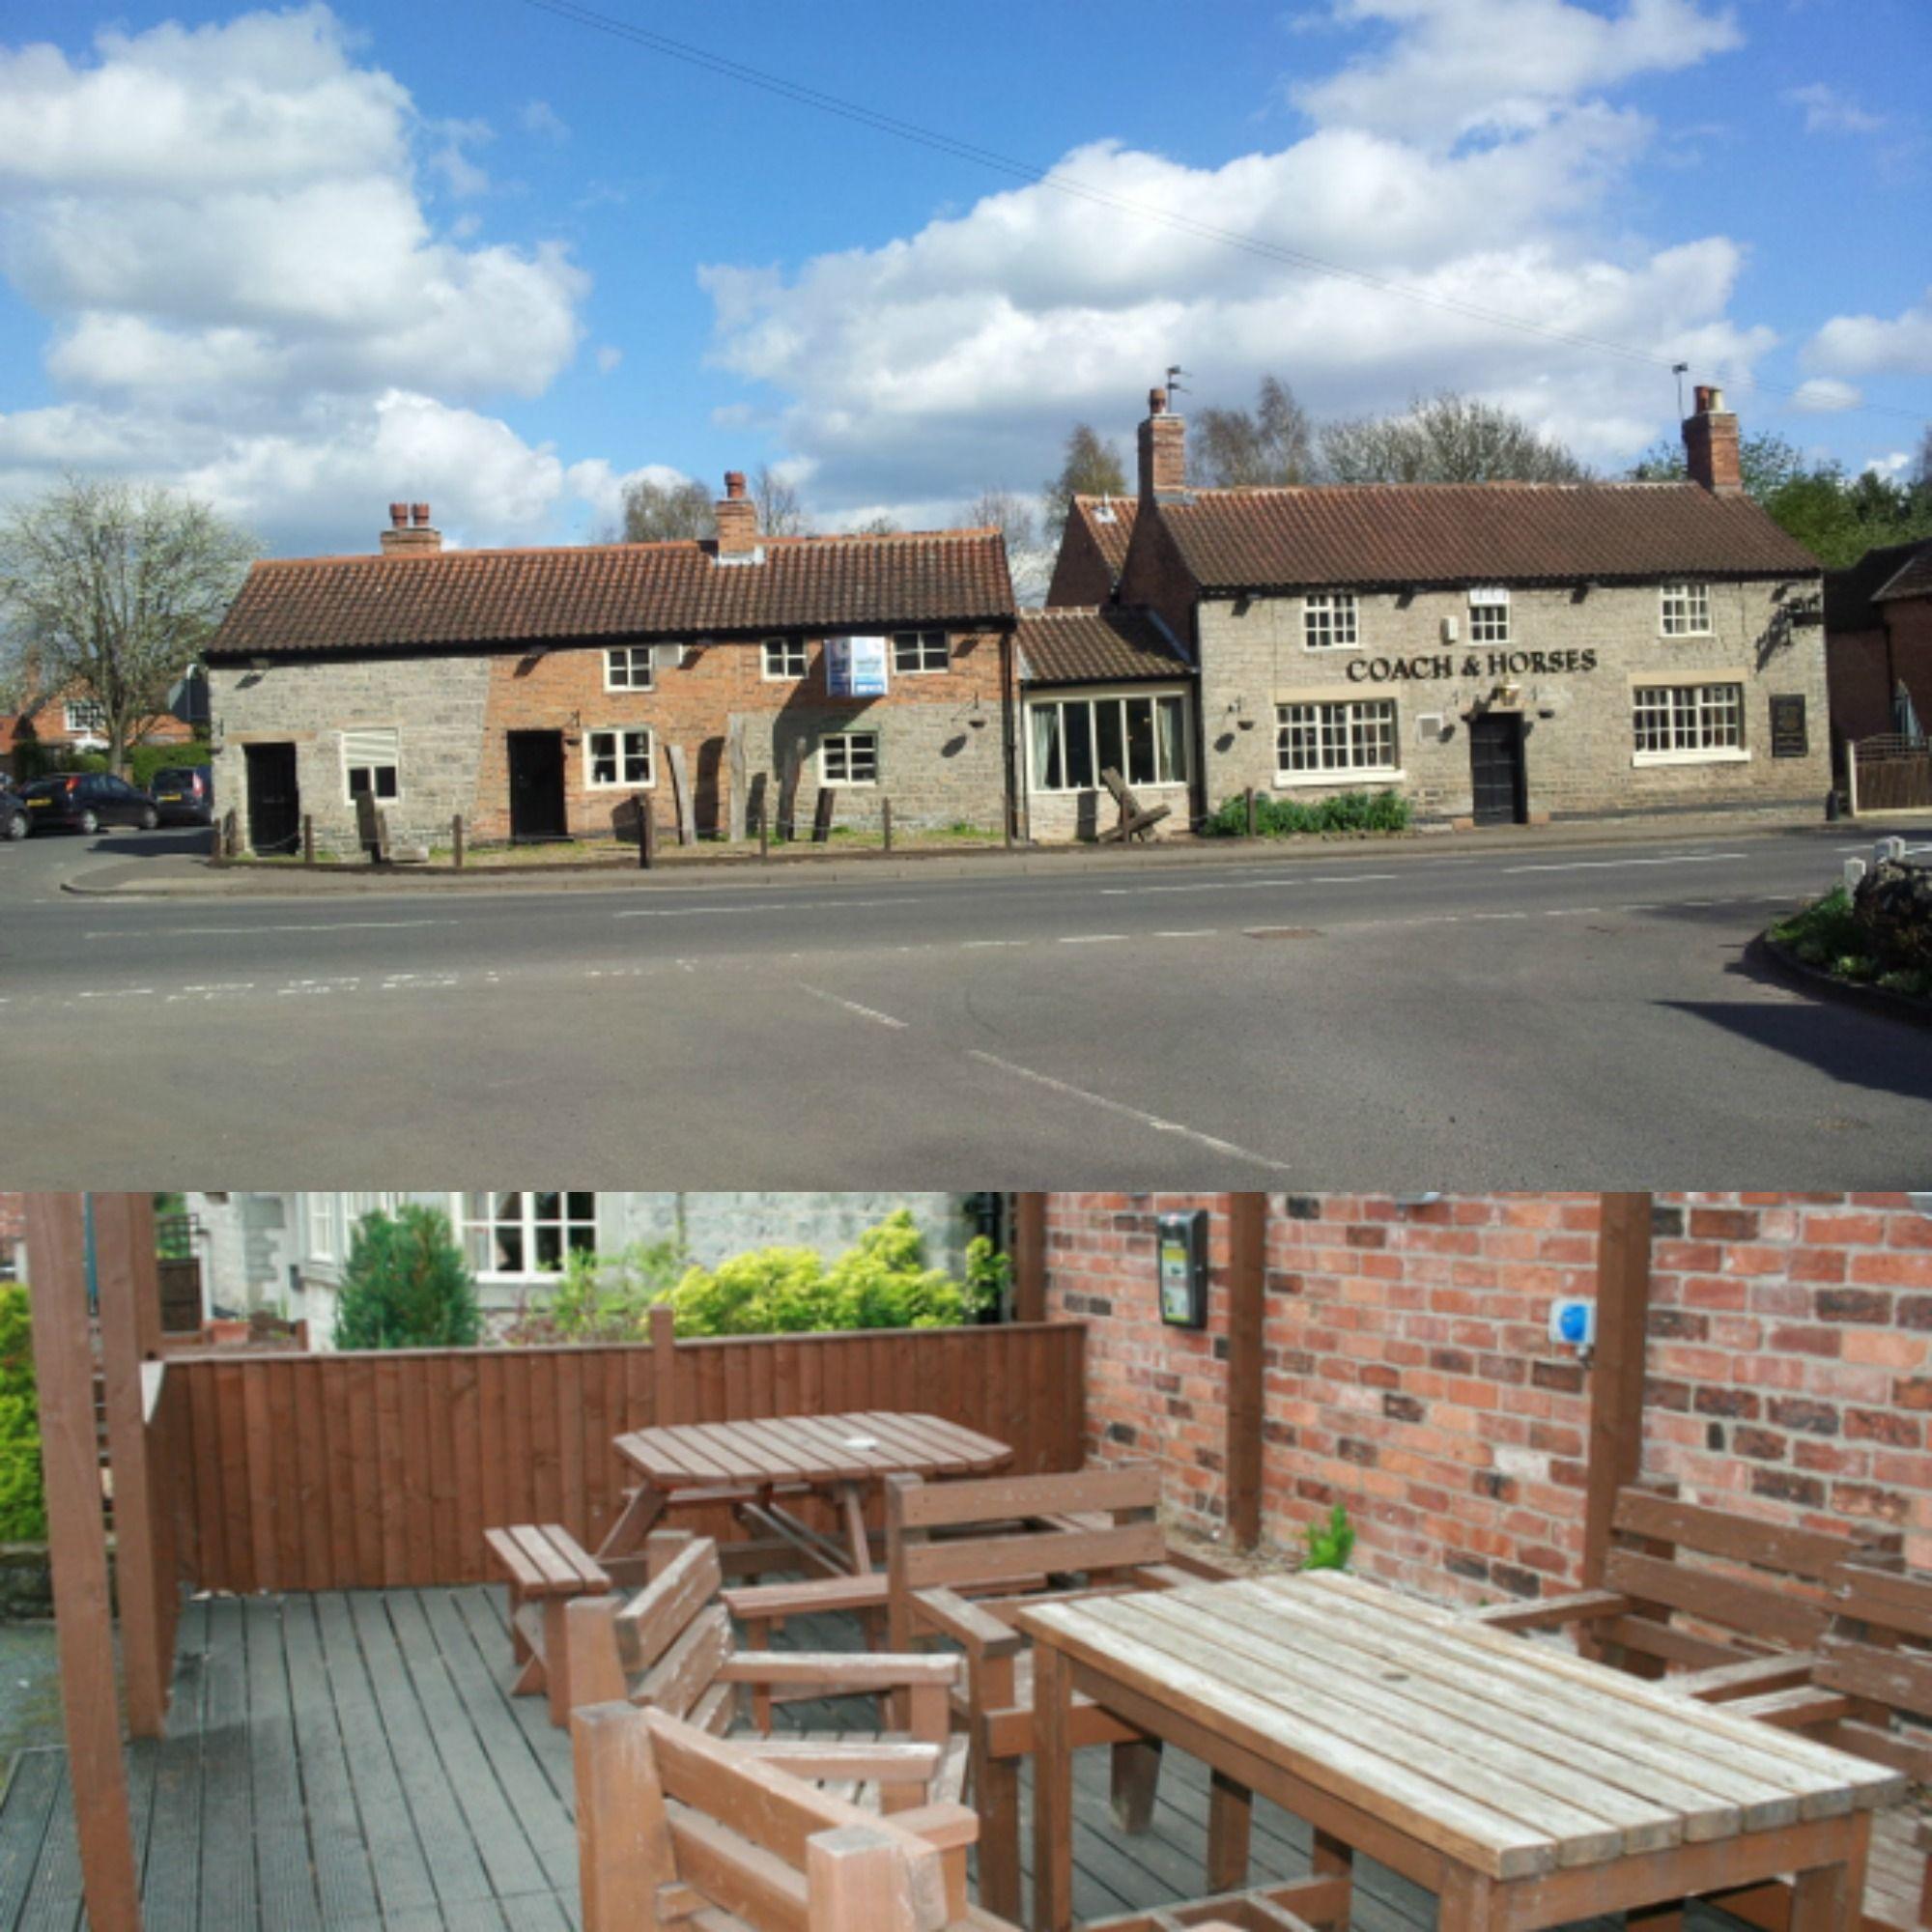 Nottinghamshire village, stone built inn. Garden with decking area.